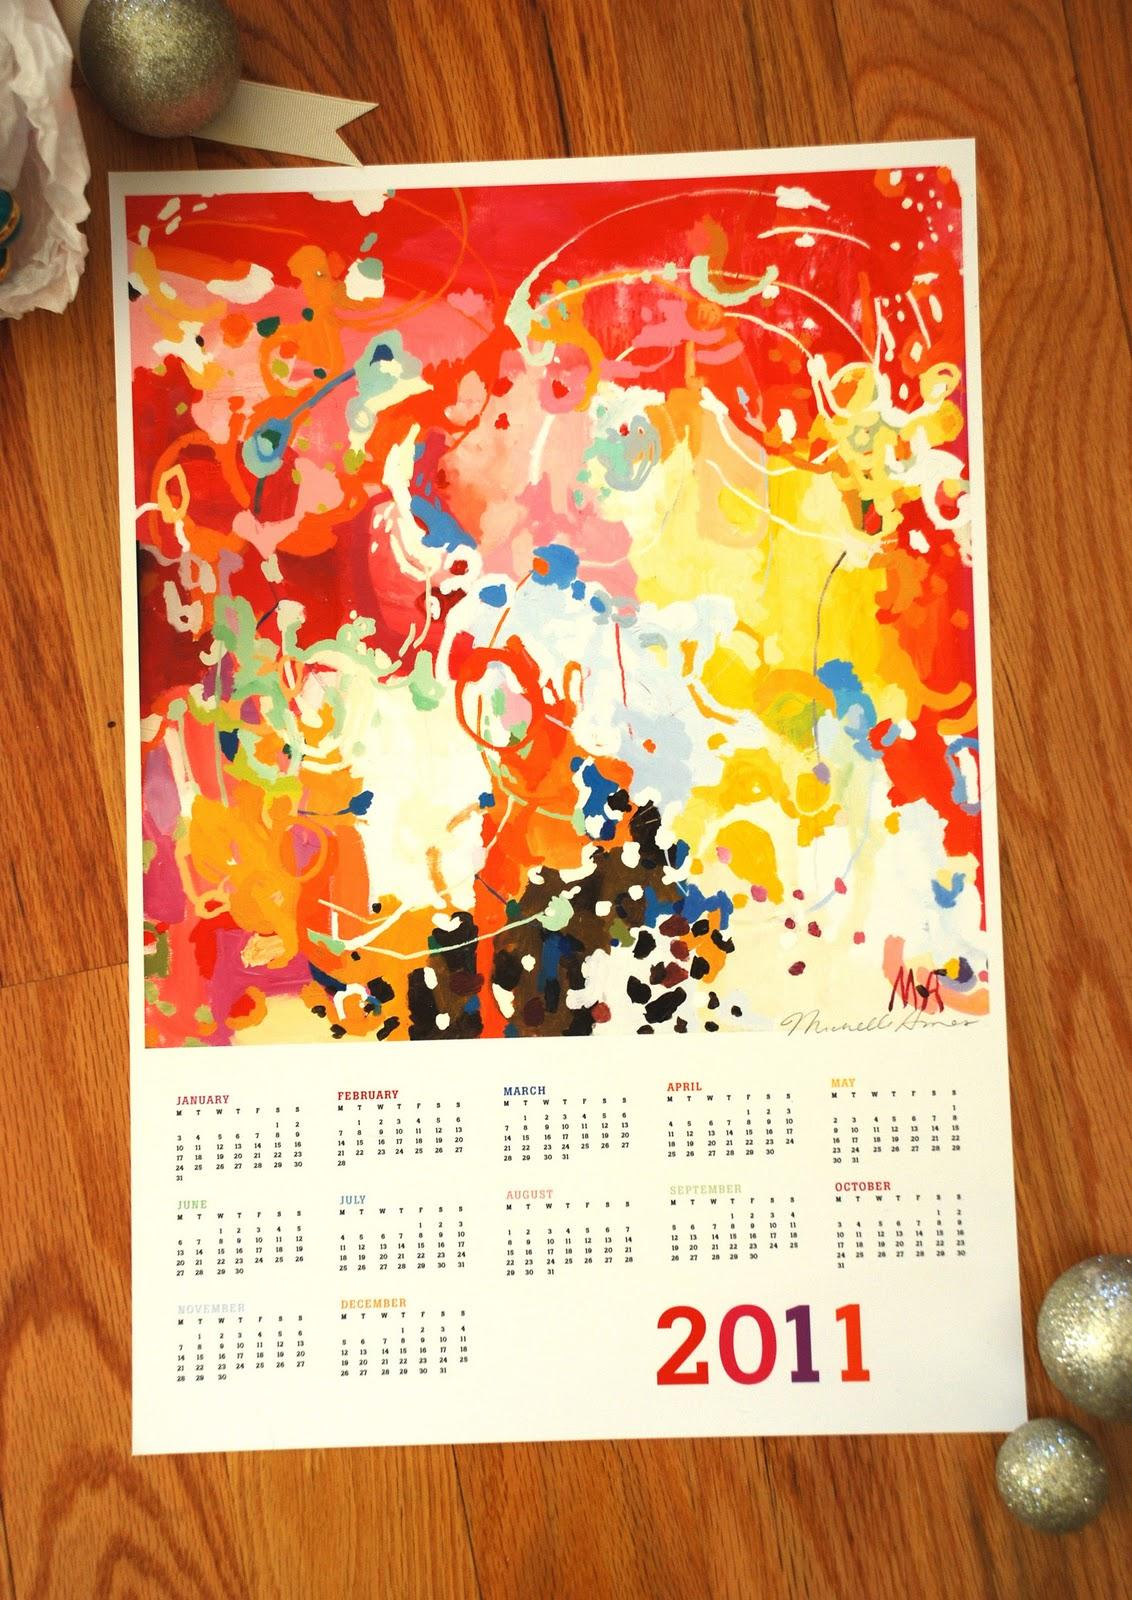 Armas Design: 2011 Calendar, and making stew